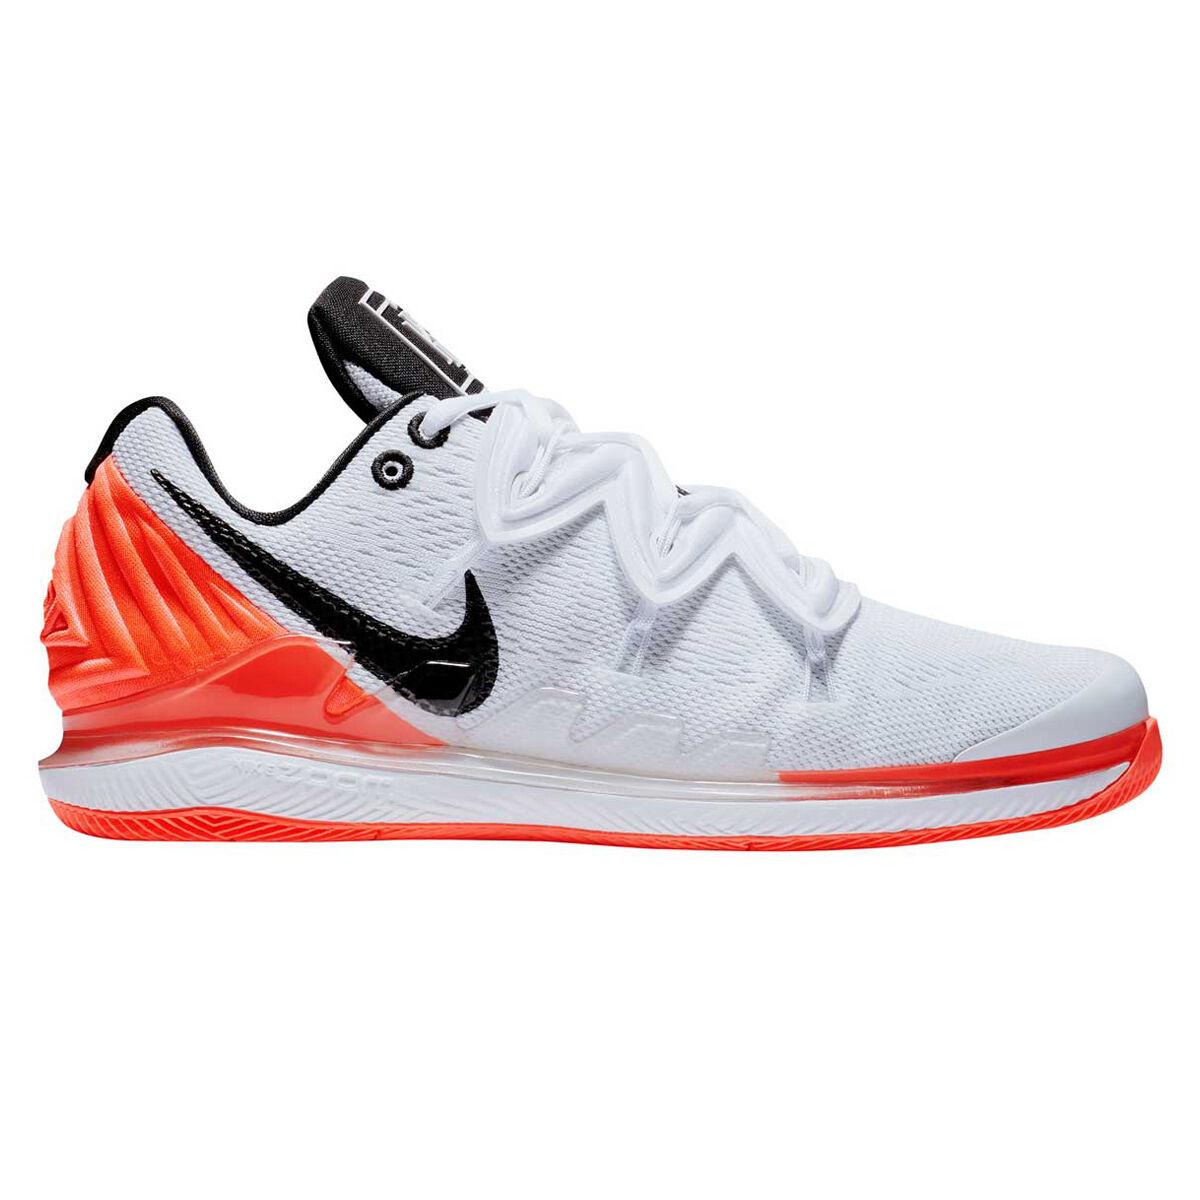 Nike Air Zoom Vapor X Kyrie 5 Mens